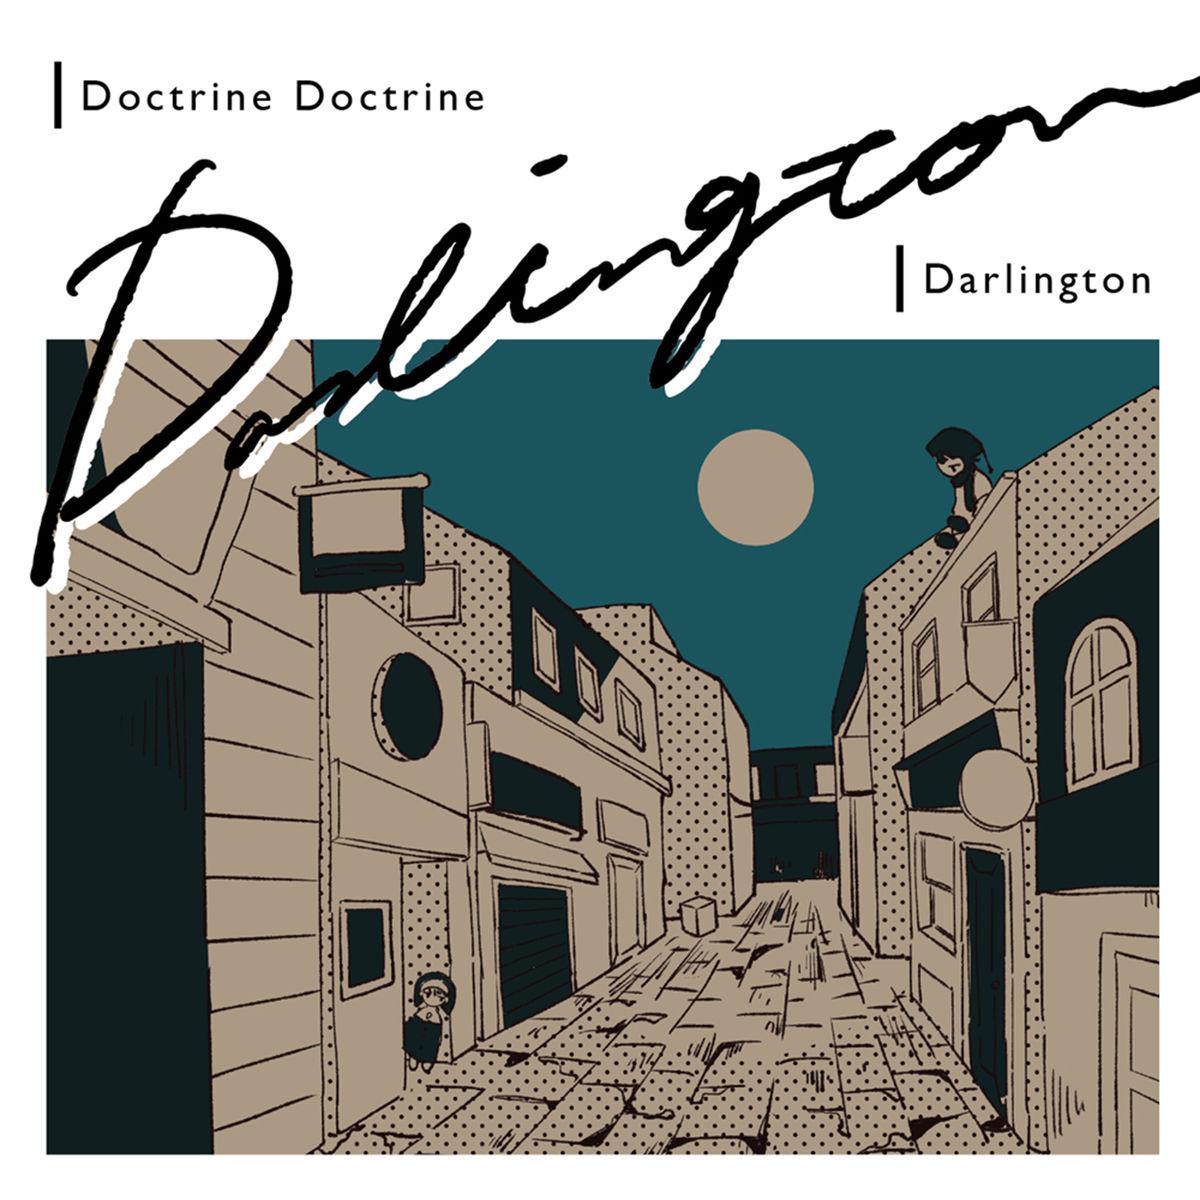 『Doctrine Doctrine - ヌギレヌ』収録の『Darlington』ジャケット